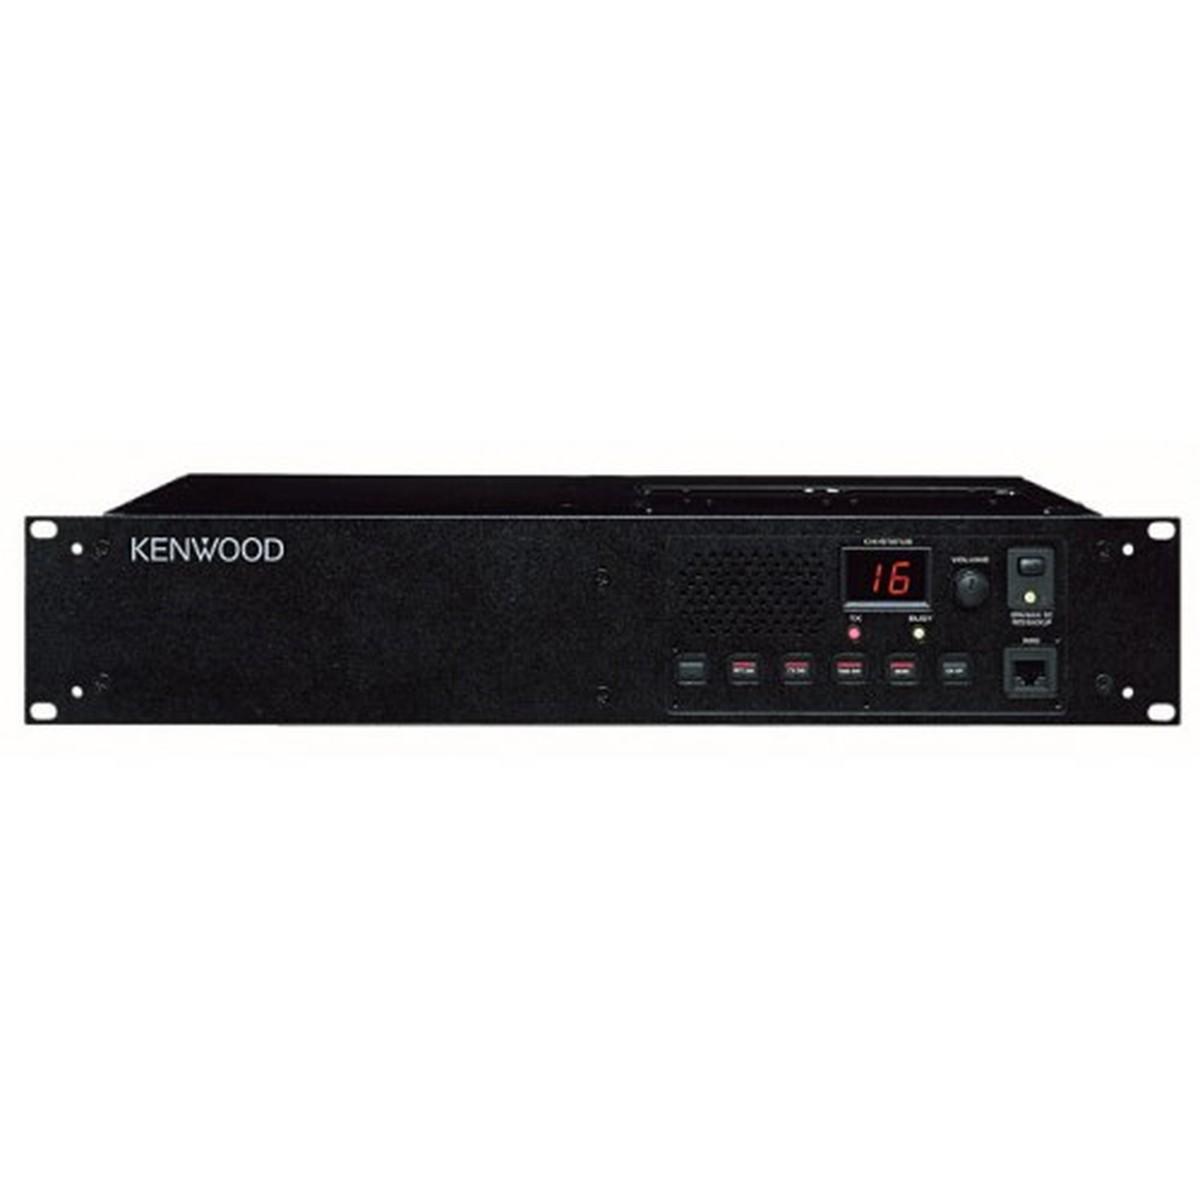 Repetidora Kenwood TKR-750 y TKR-850 Analógica